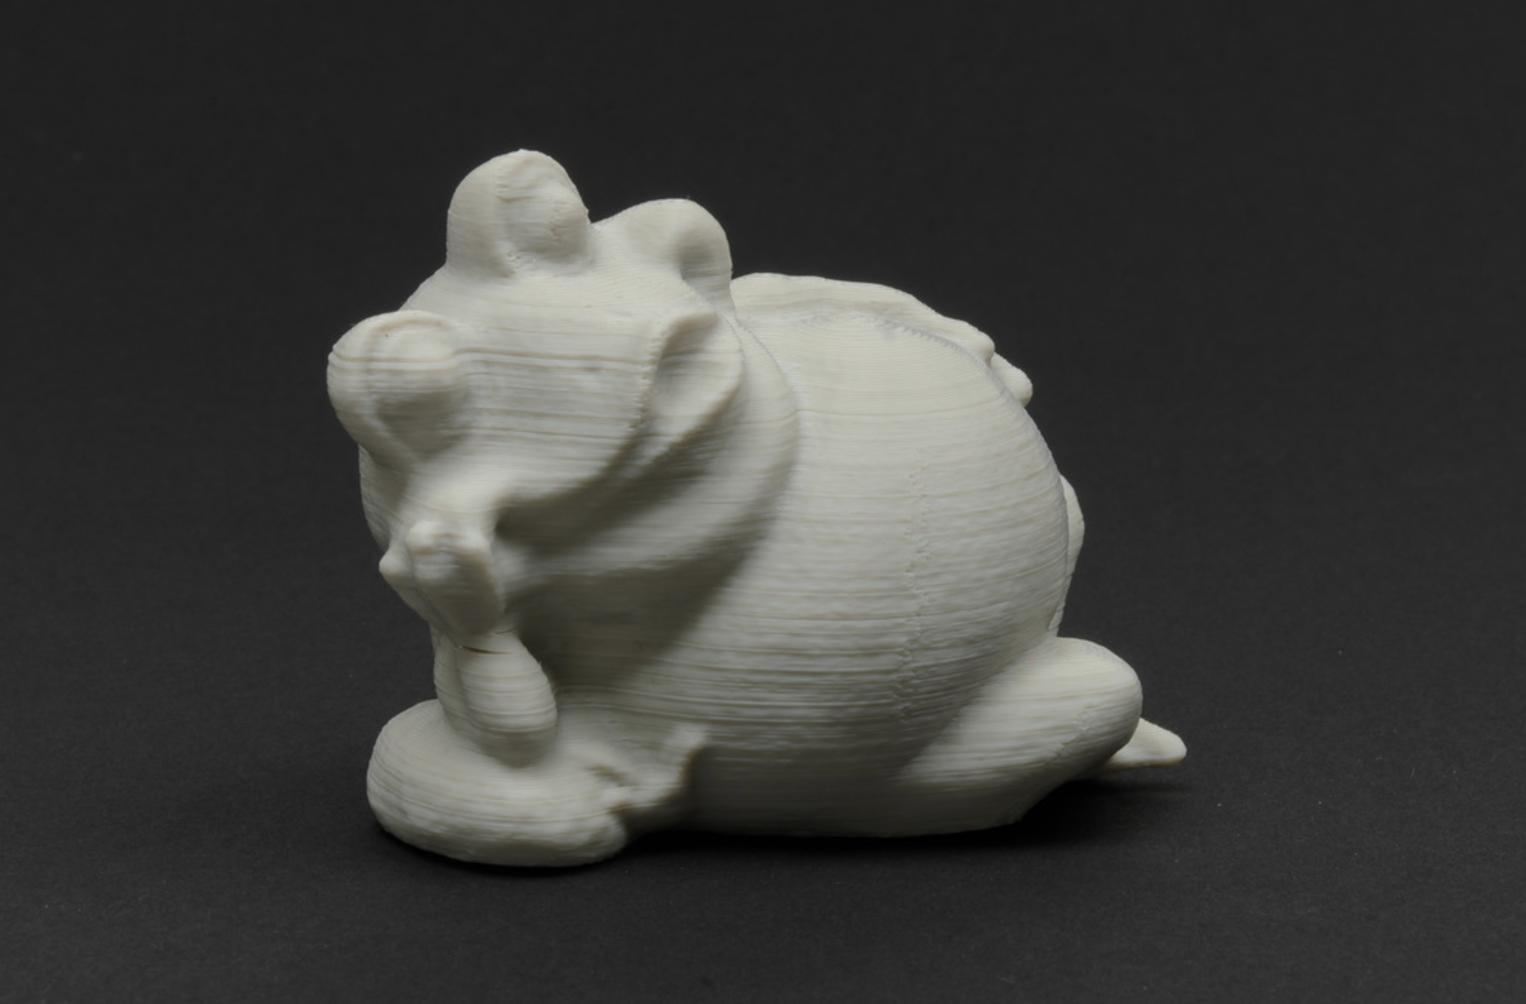 Capture d'écran 2017-02-24 à 17.29.24.png Download free STL file Garden Frog • 3D printable model, WorksBySolo